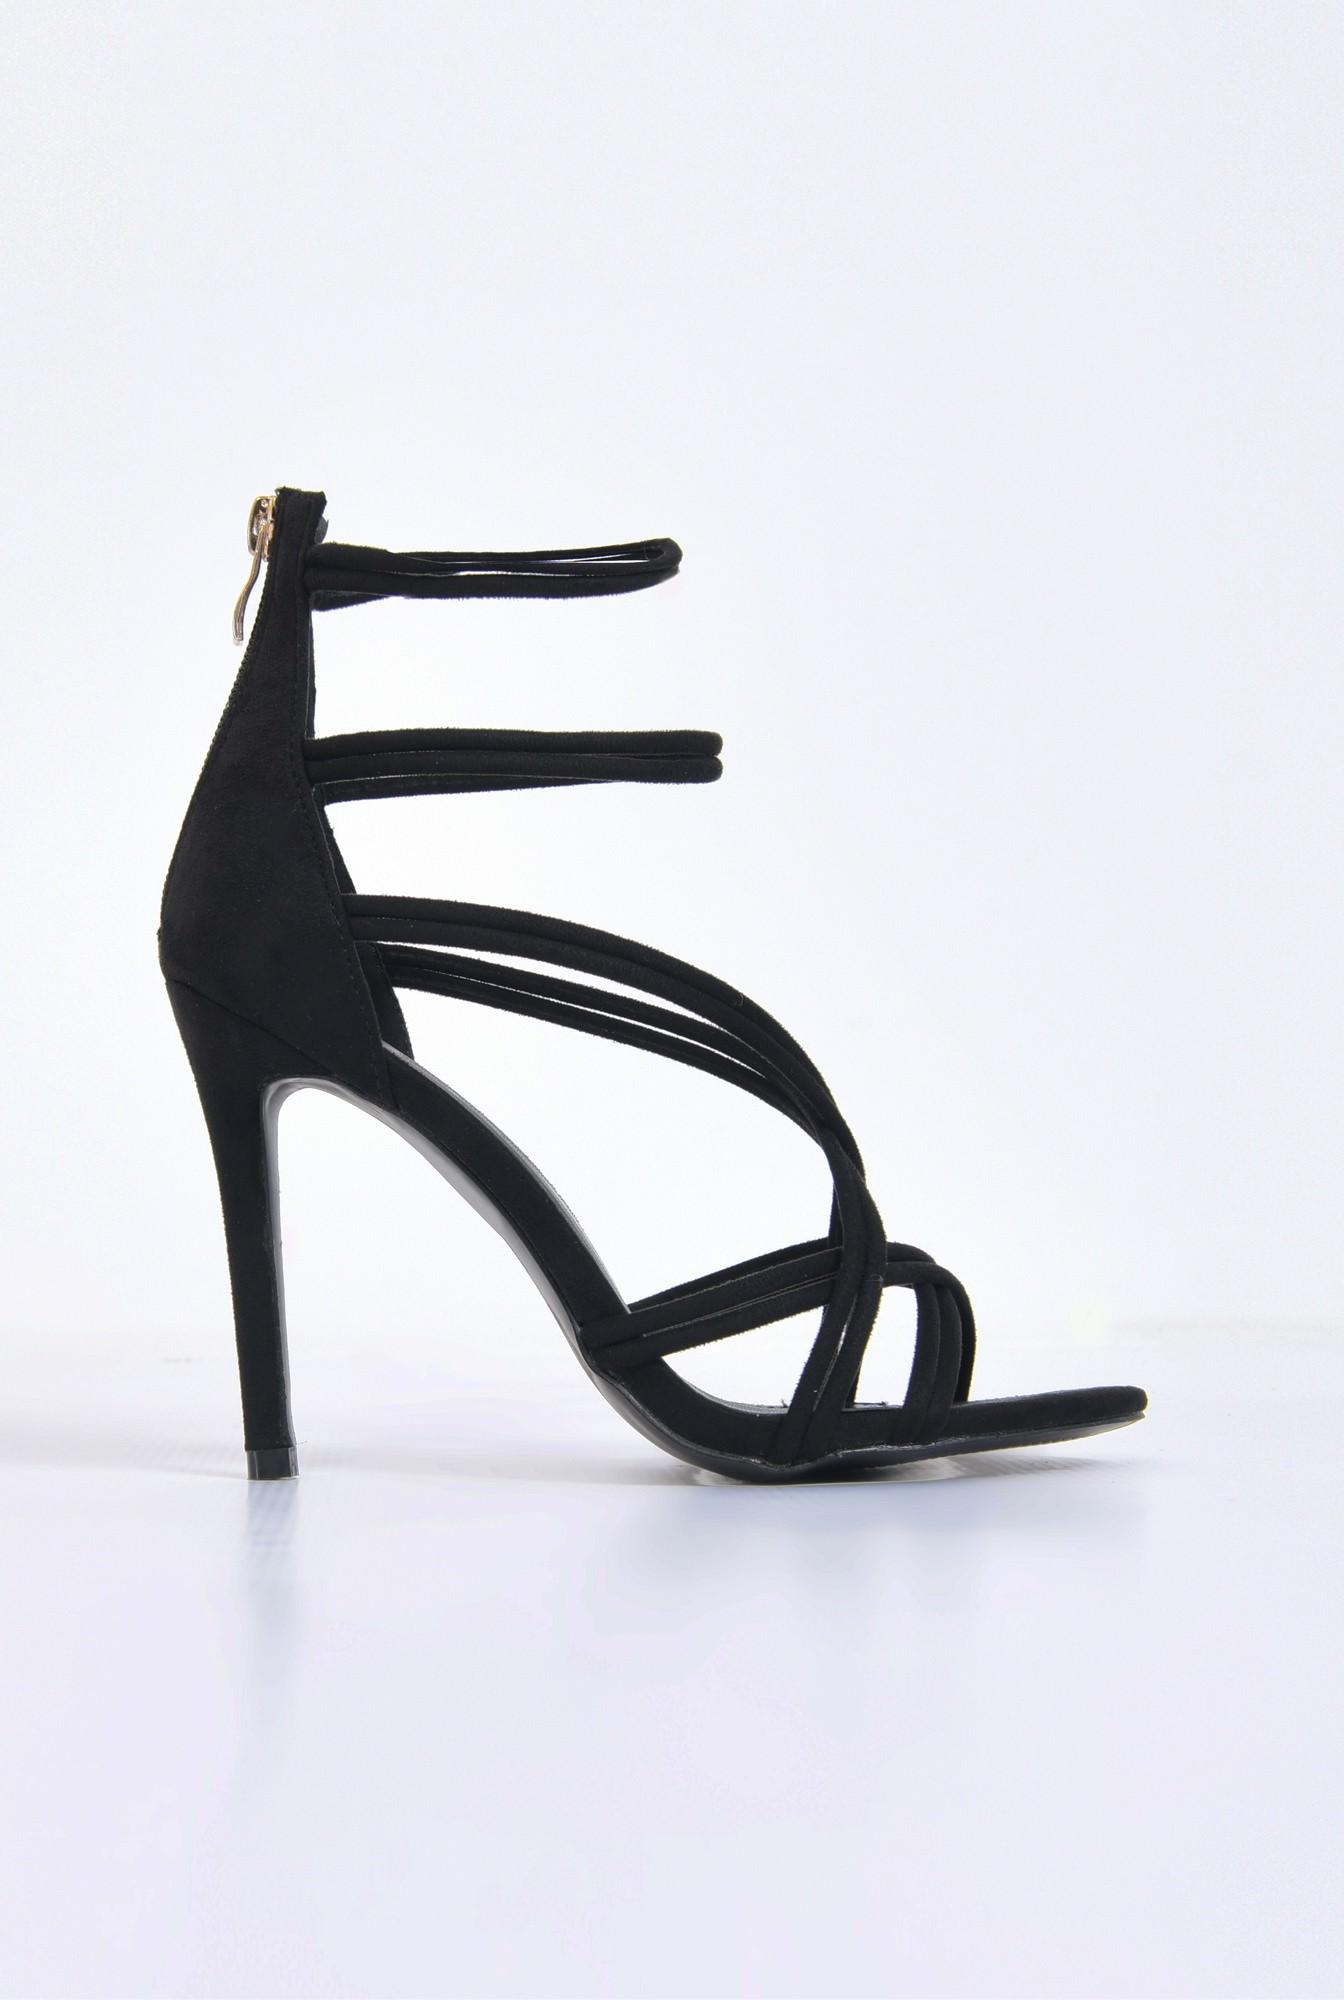 0 - sandale elegante, negre, catifea, stiletto